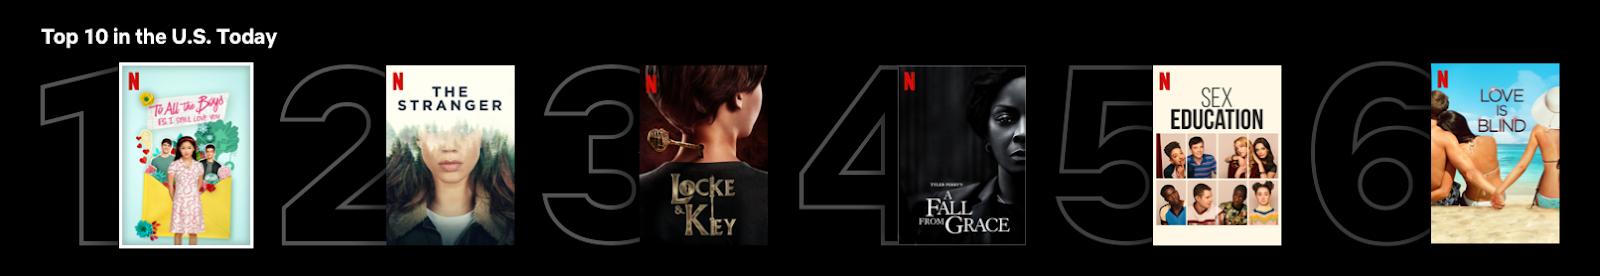 Netflix top 10 popular